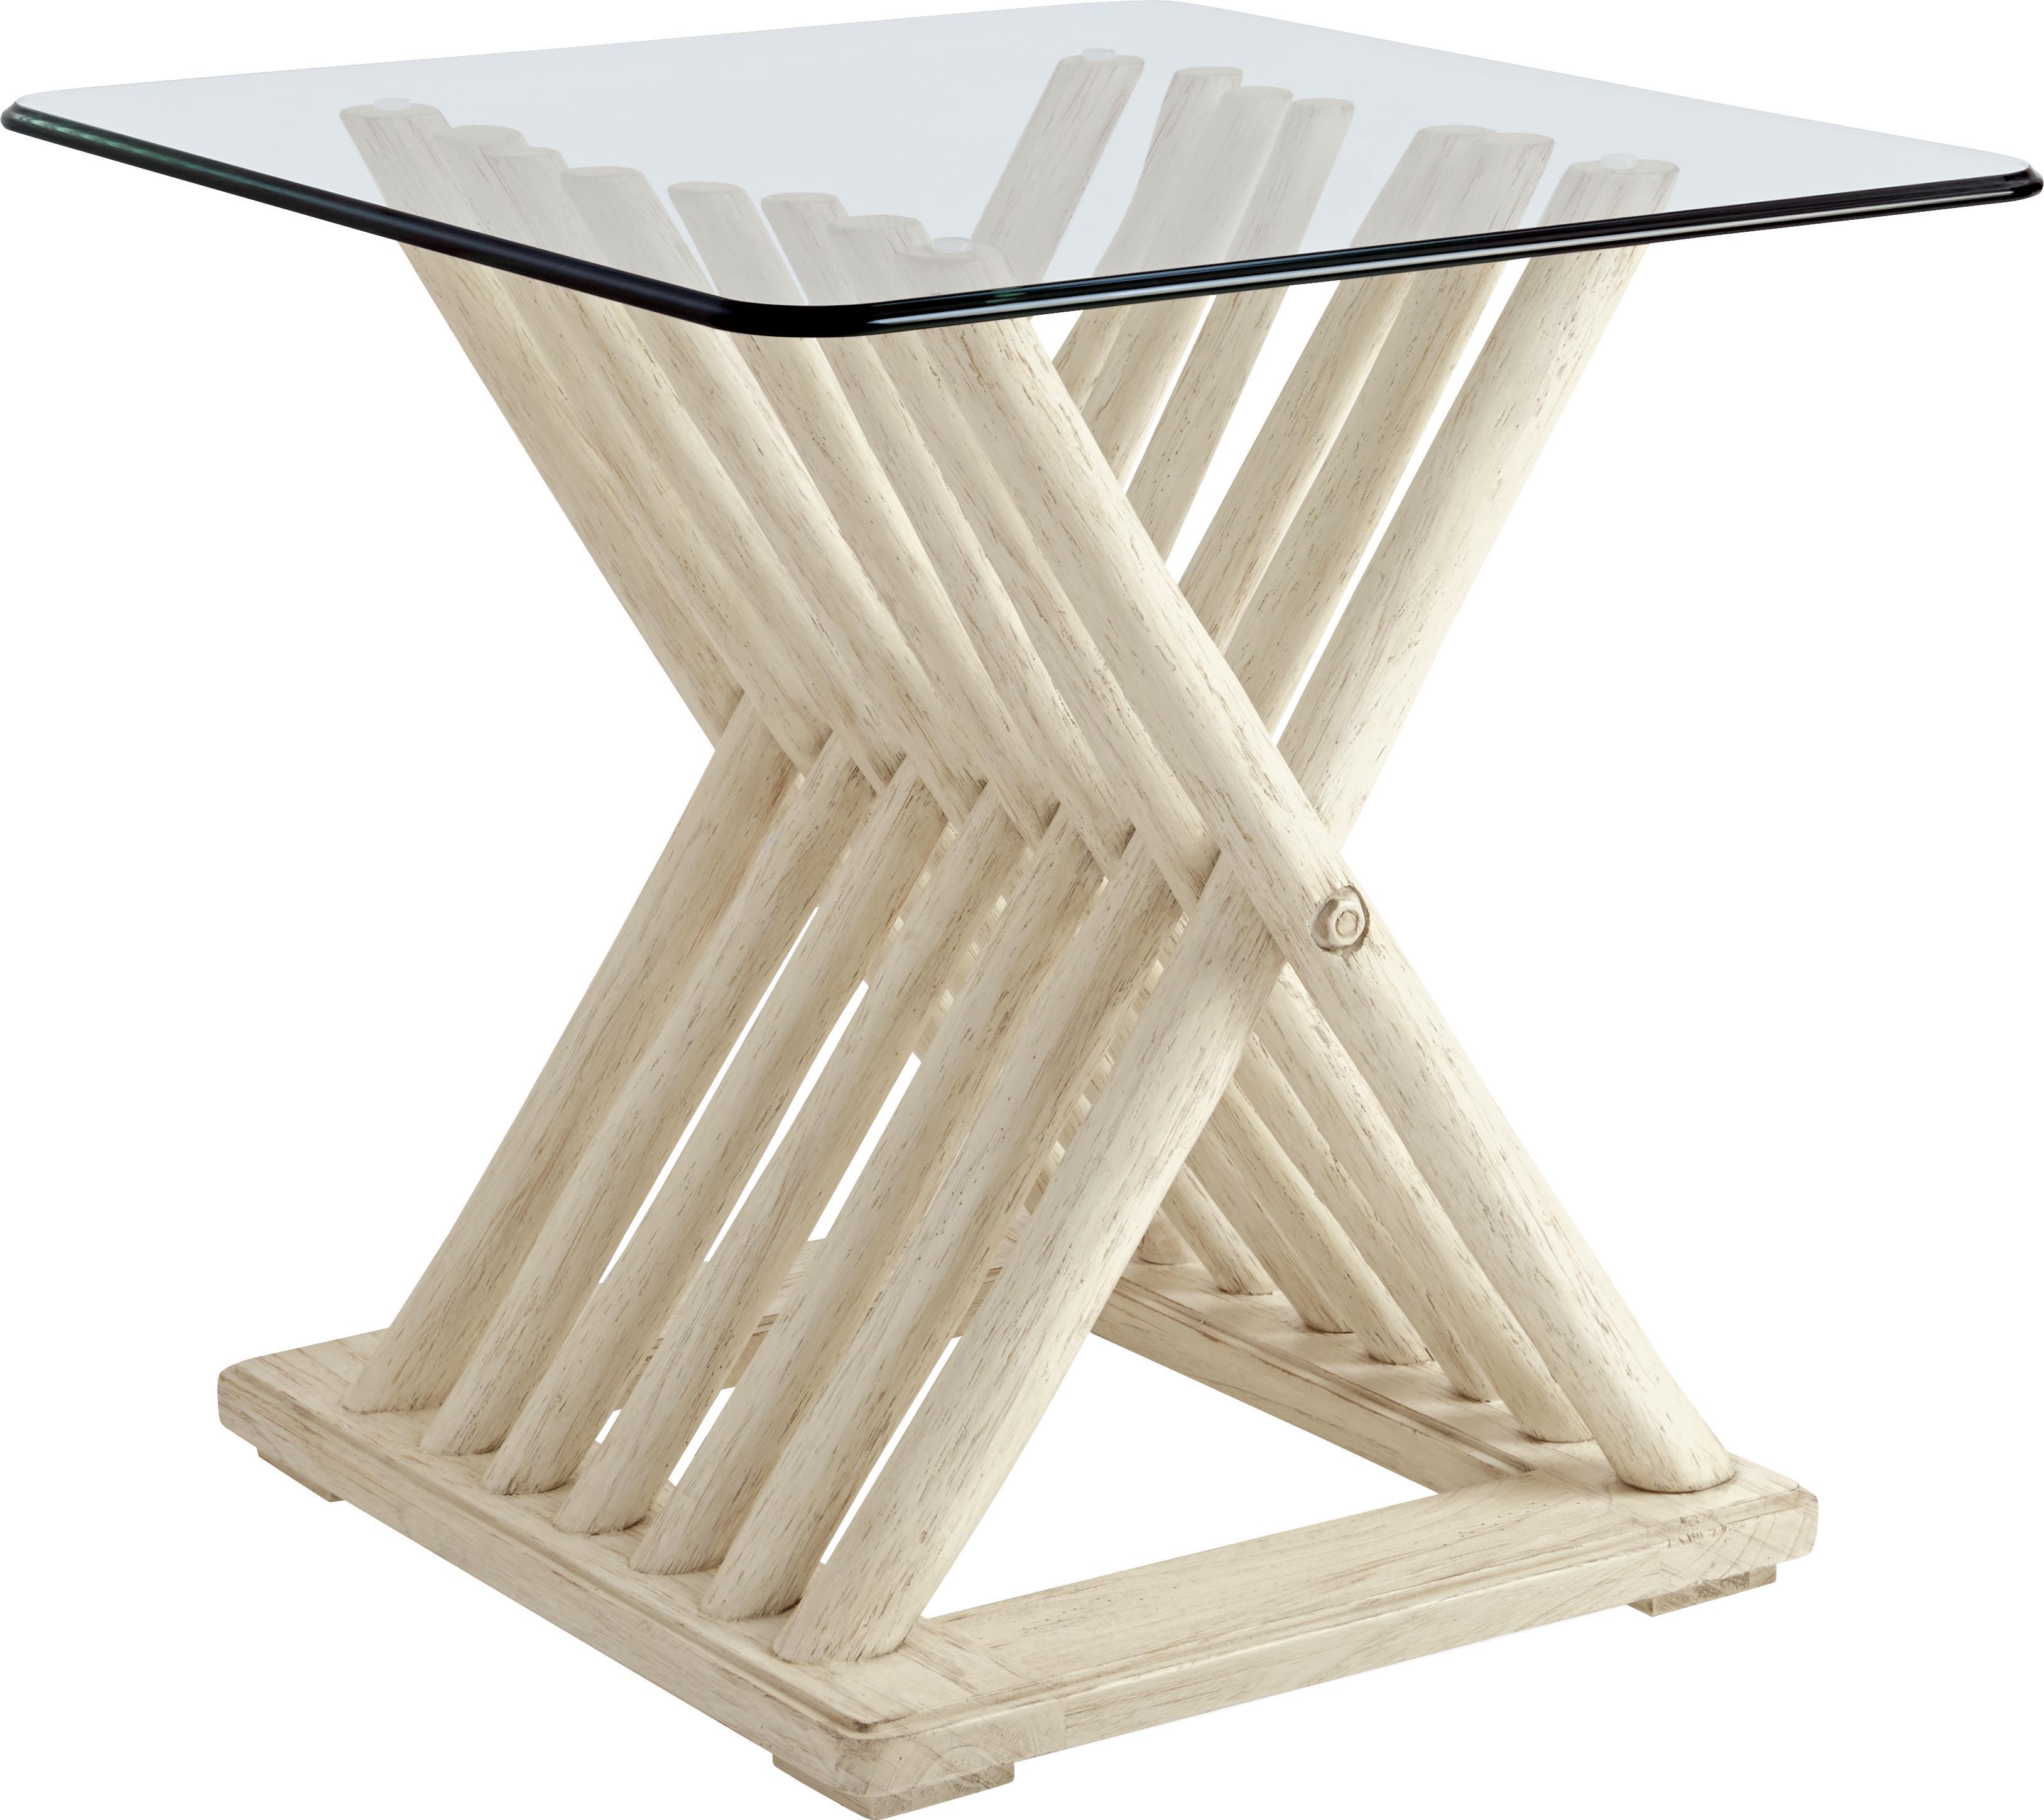 Stanley Furniture Coastal Living Resort Driftwood Flats End Table - Item Number: 062-A5-14